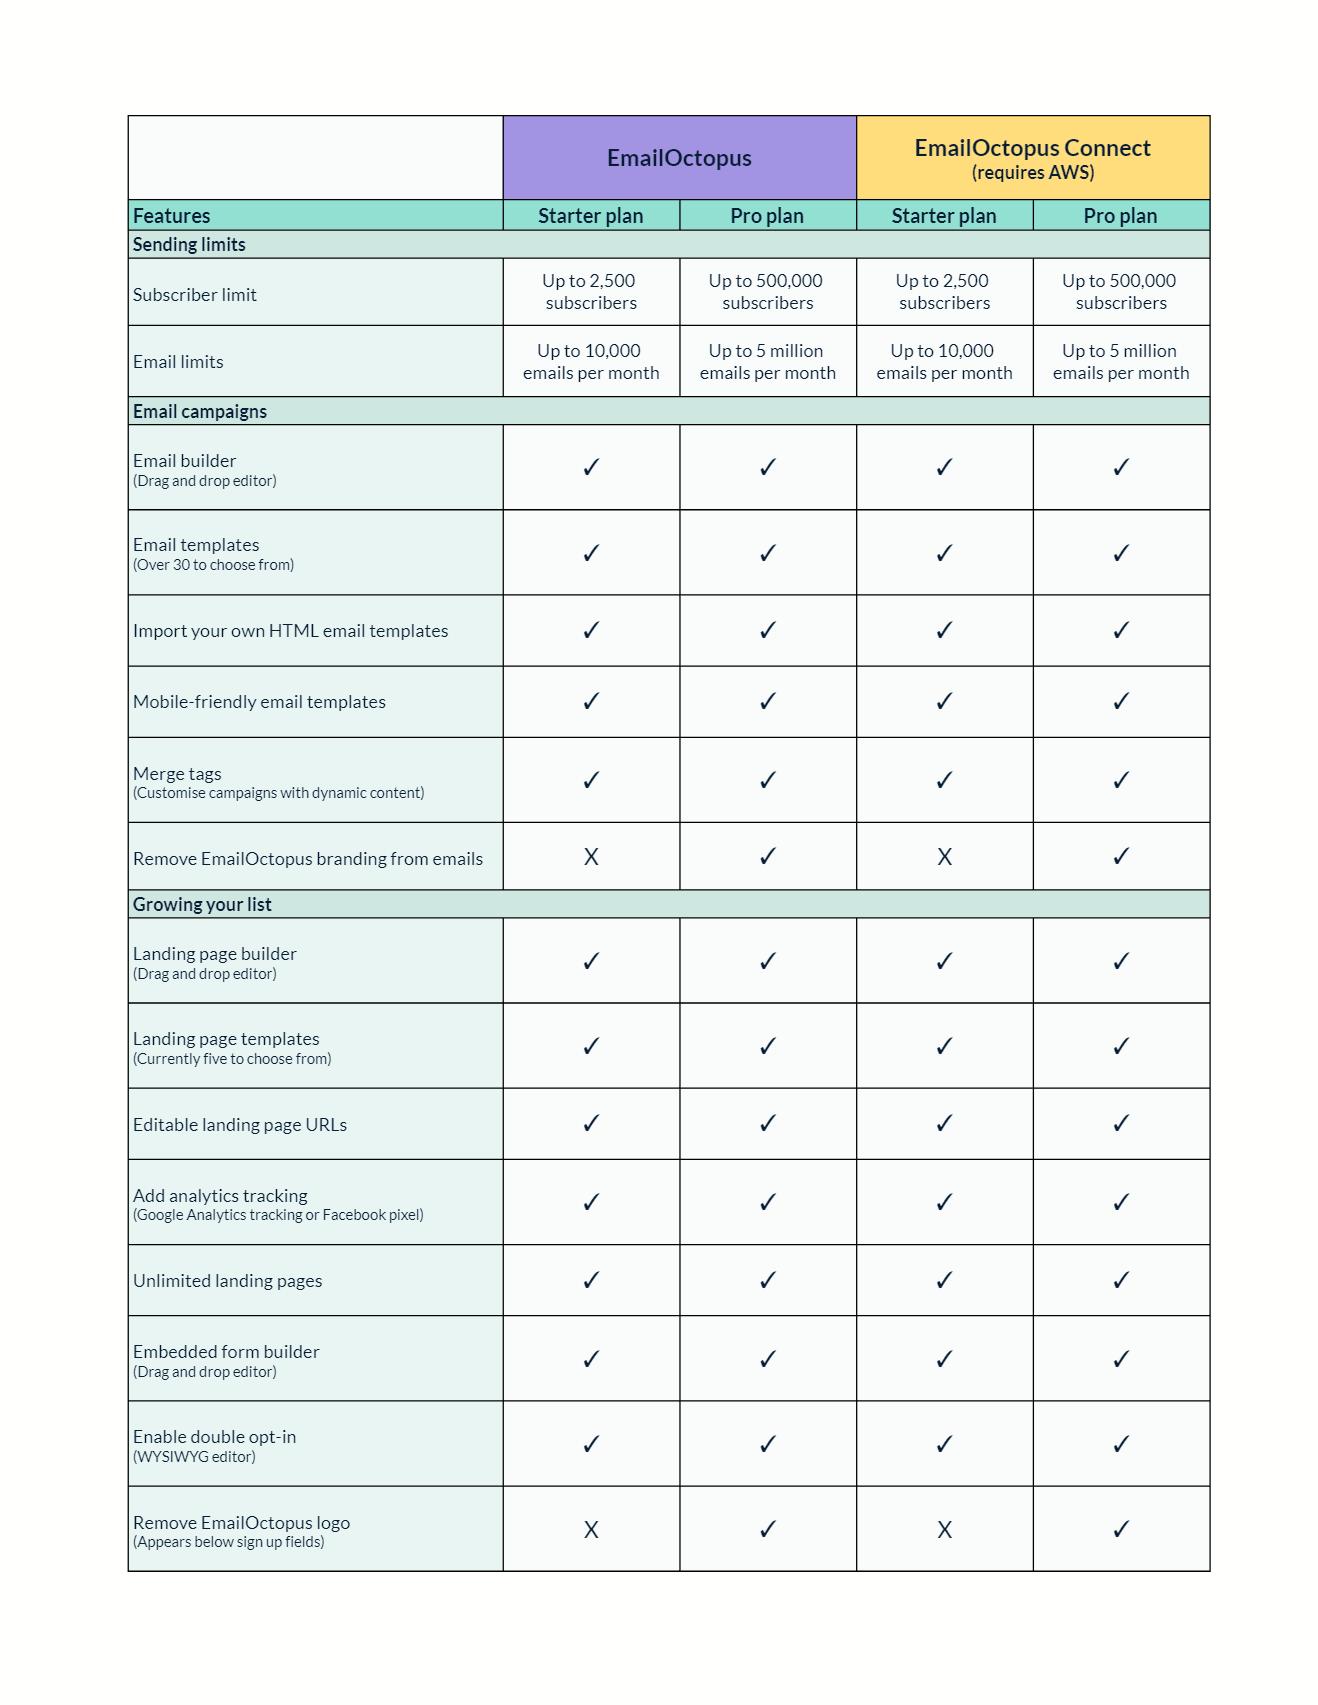 Emailoctopus features list